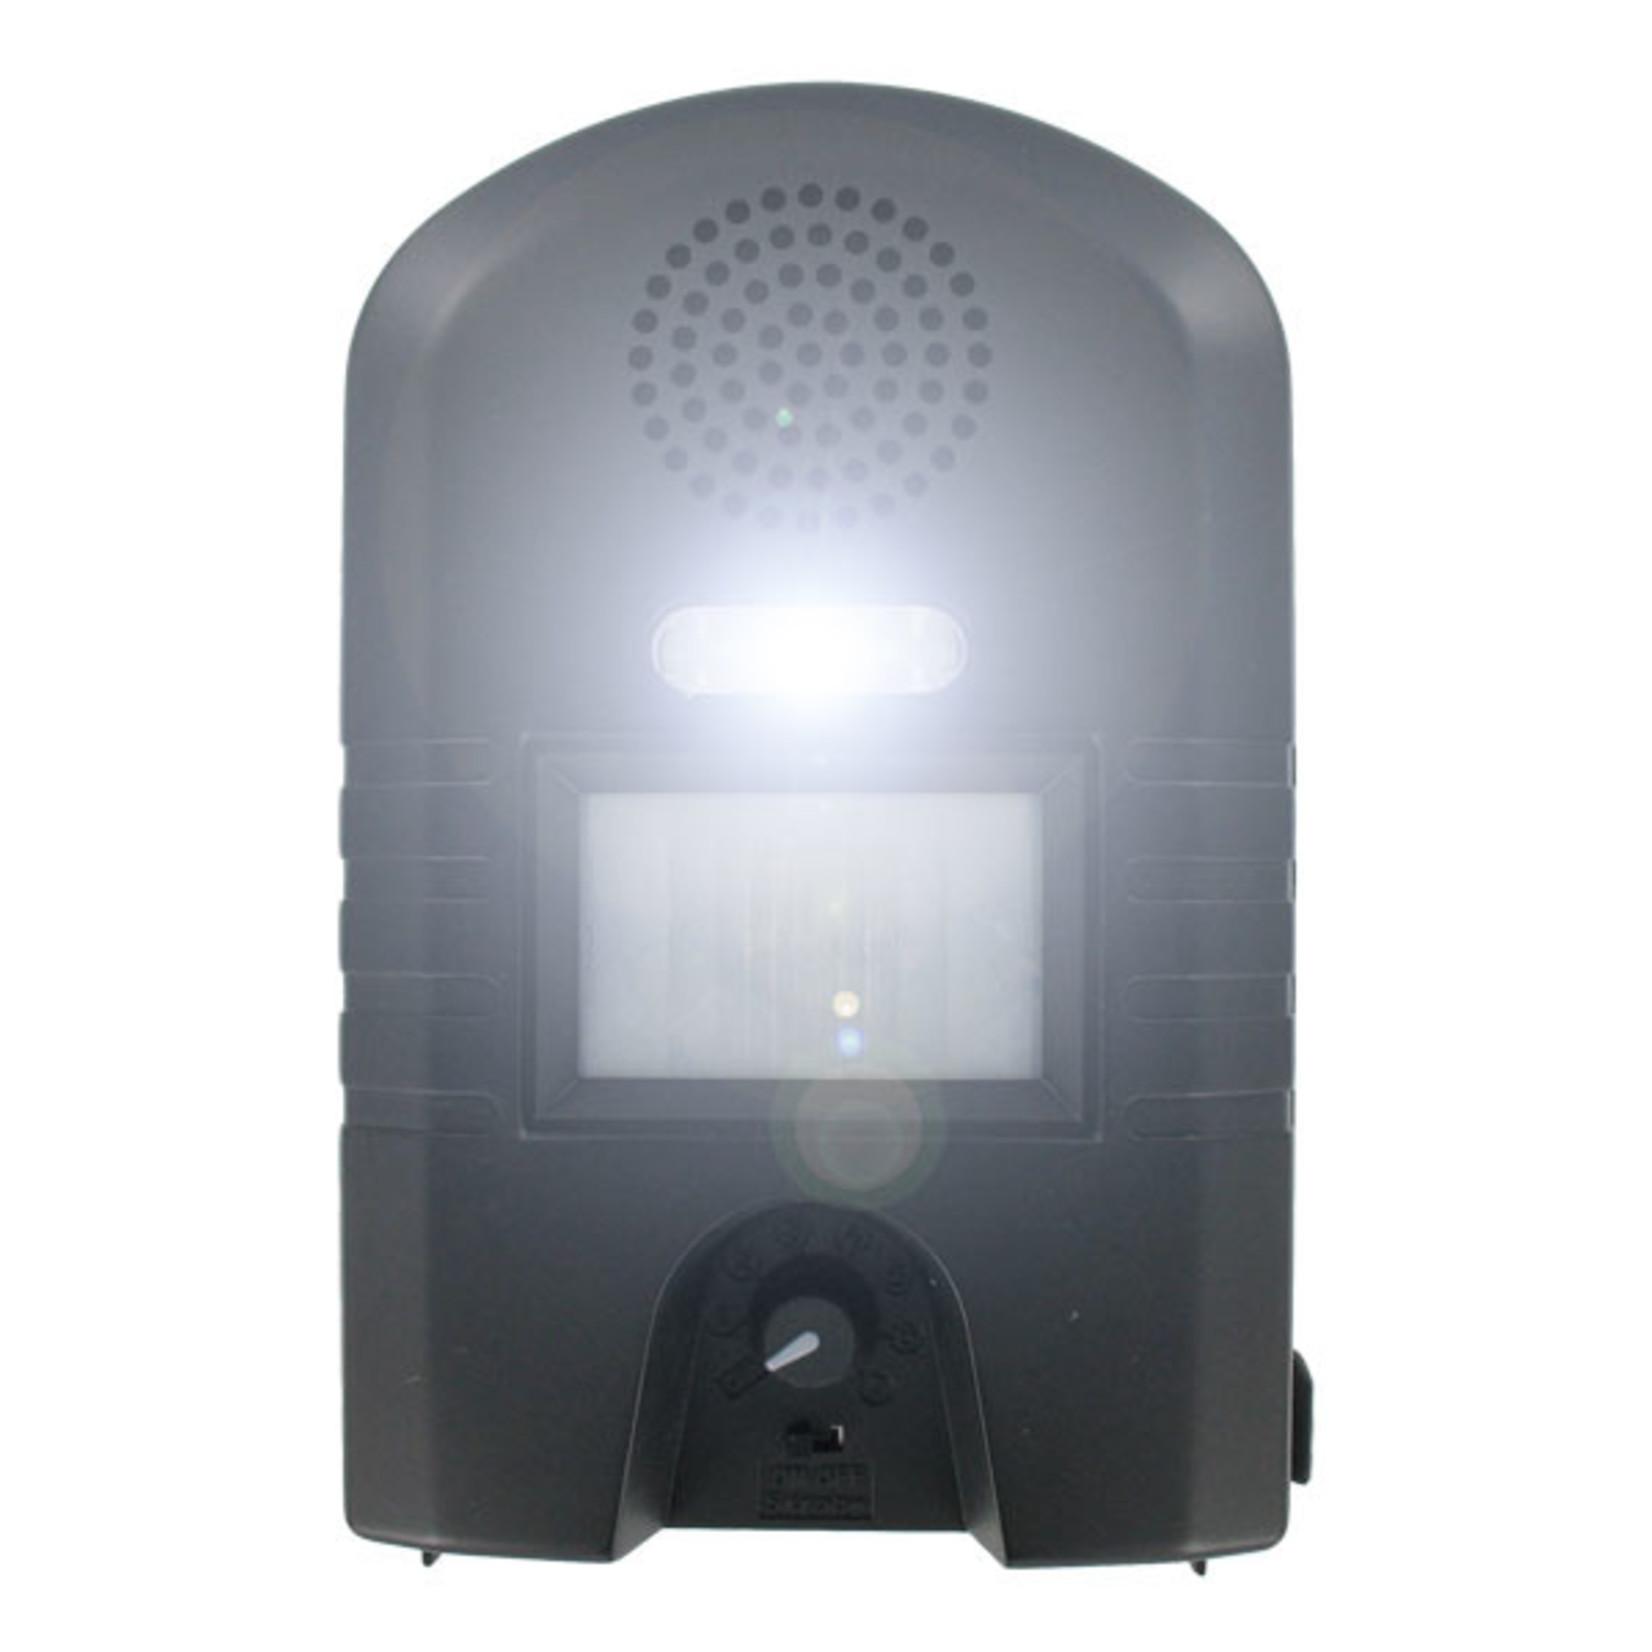 Weitech Garden Protector W0052 Ultrasone ongedierte verjager met flitslicht